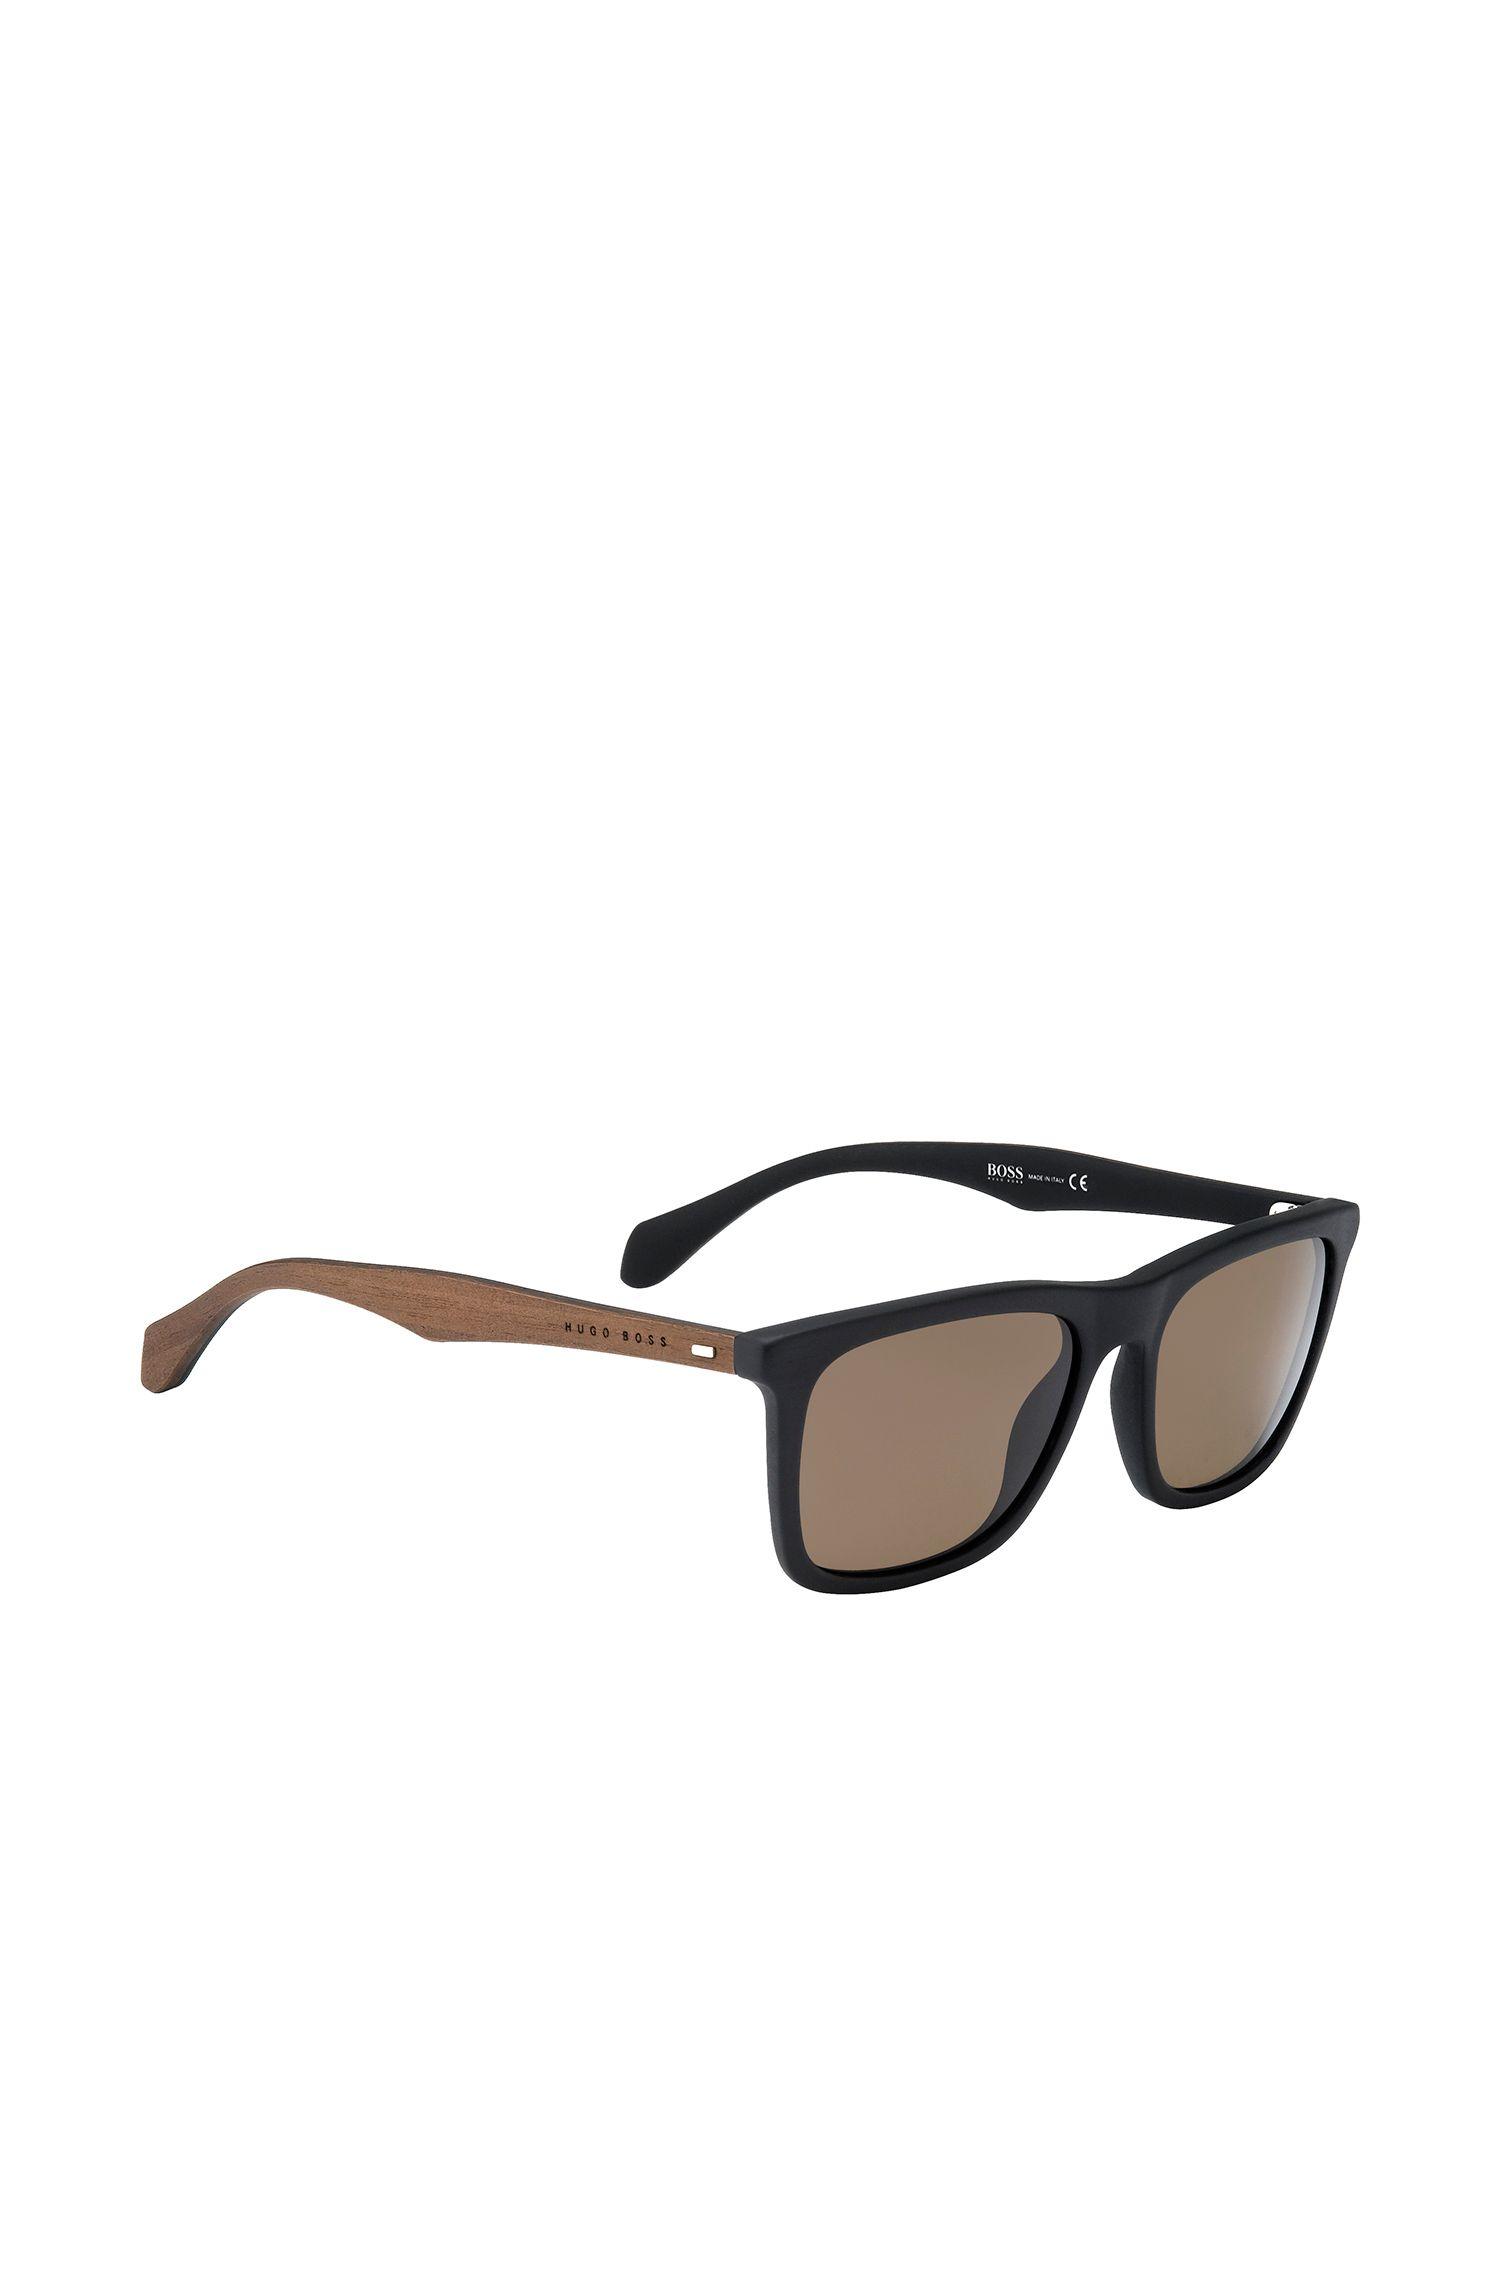 Bronze Polar Lens Rectangular Sunglasses   BOSS 0776S, Assorted-Pre-Pack